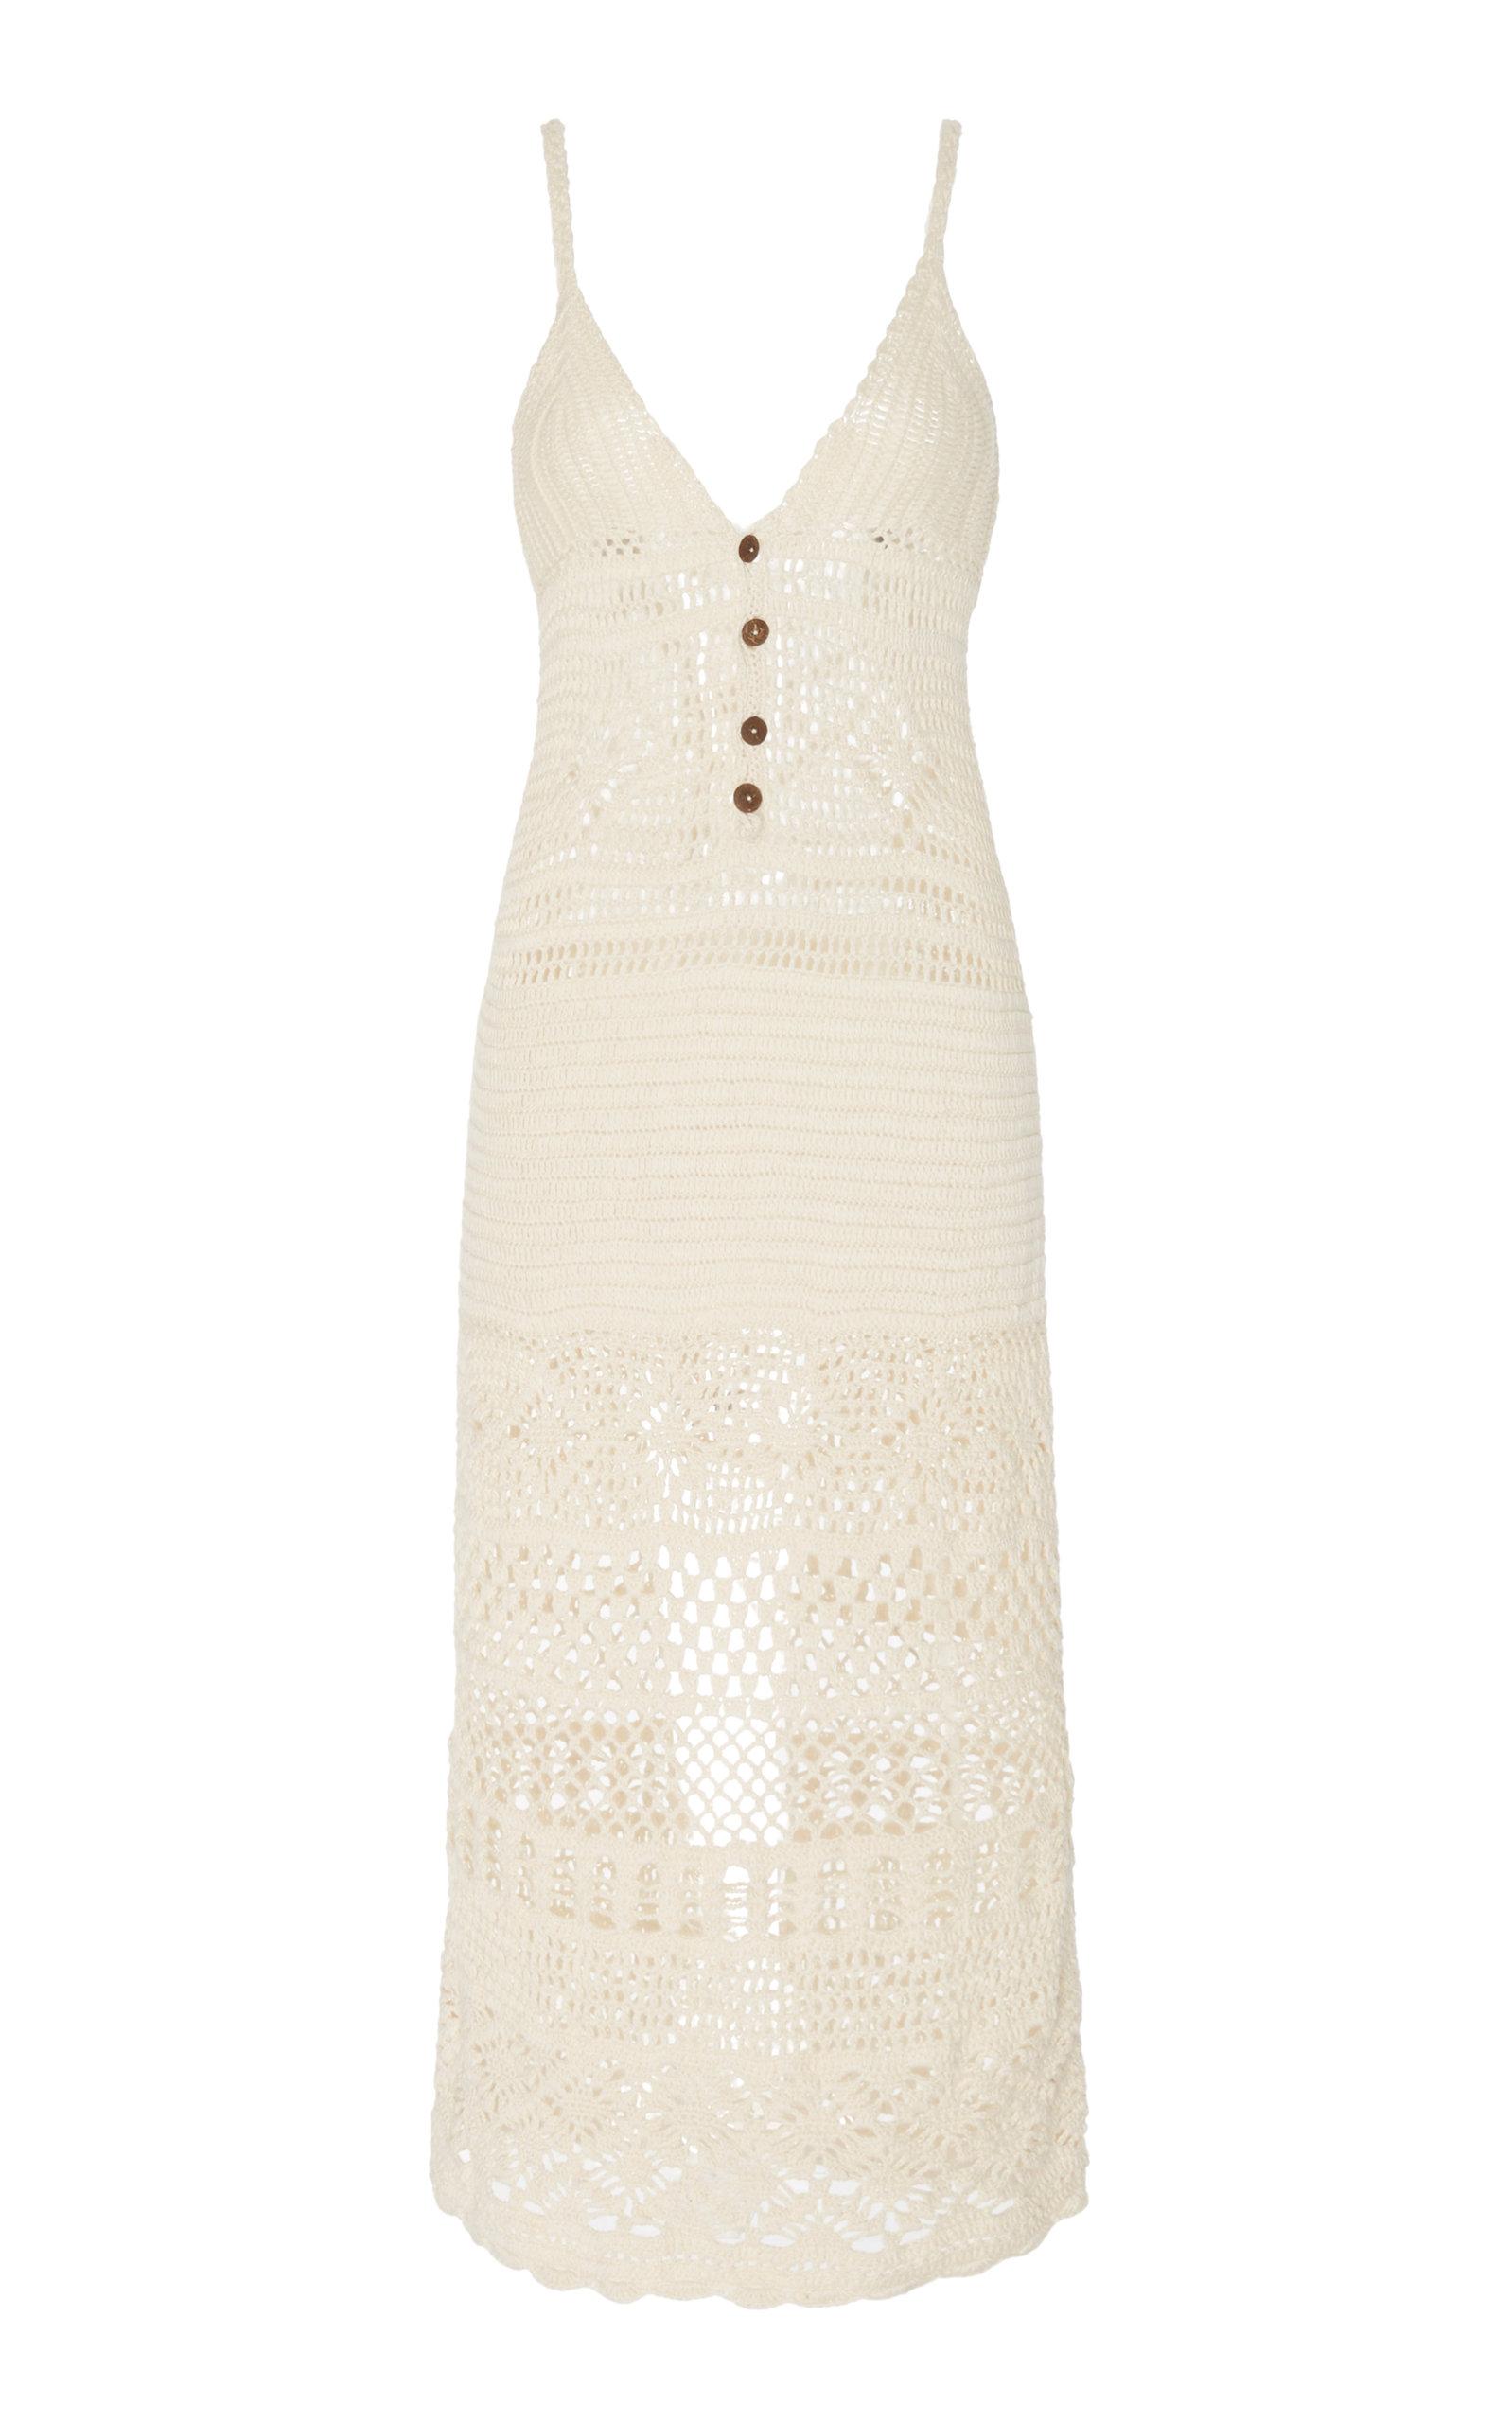 Buy Akoia Swim Esme Crocheted Cotton Midi Dress online, shop Akoia Swim at the best price